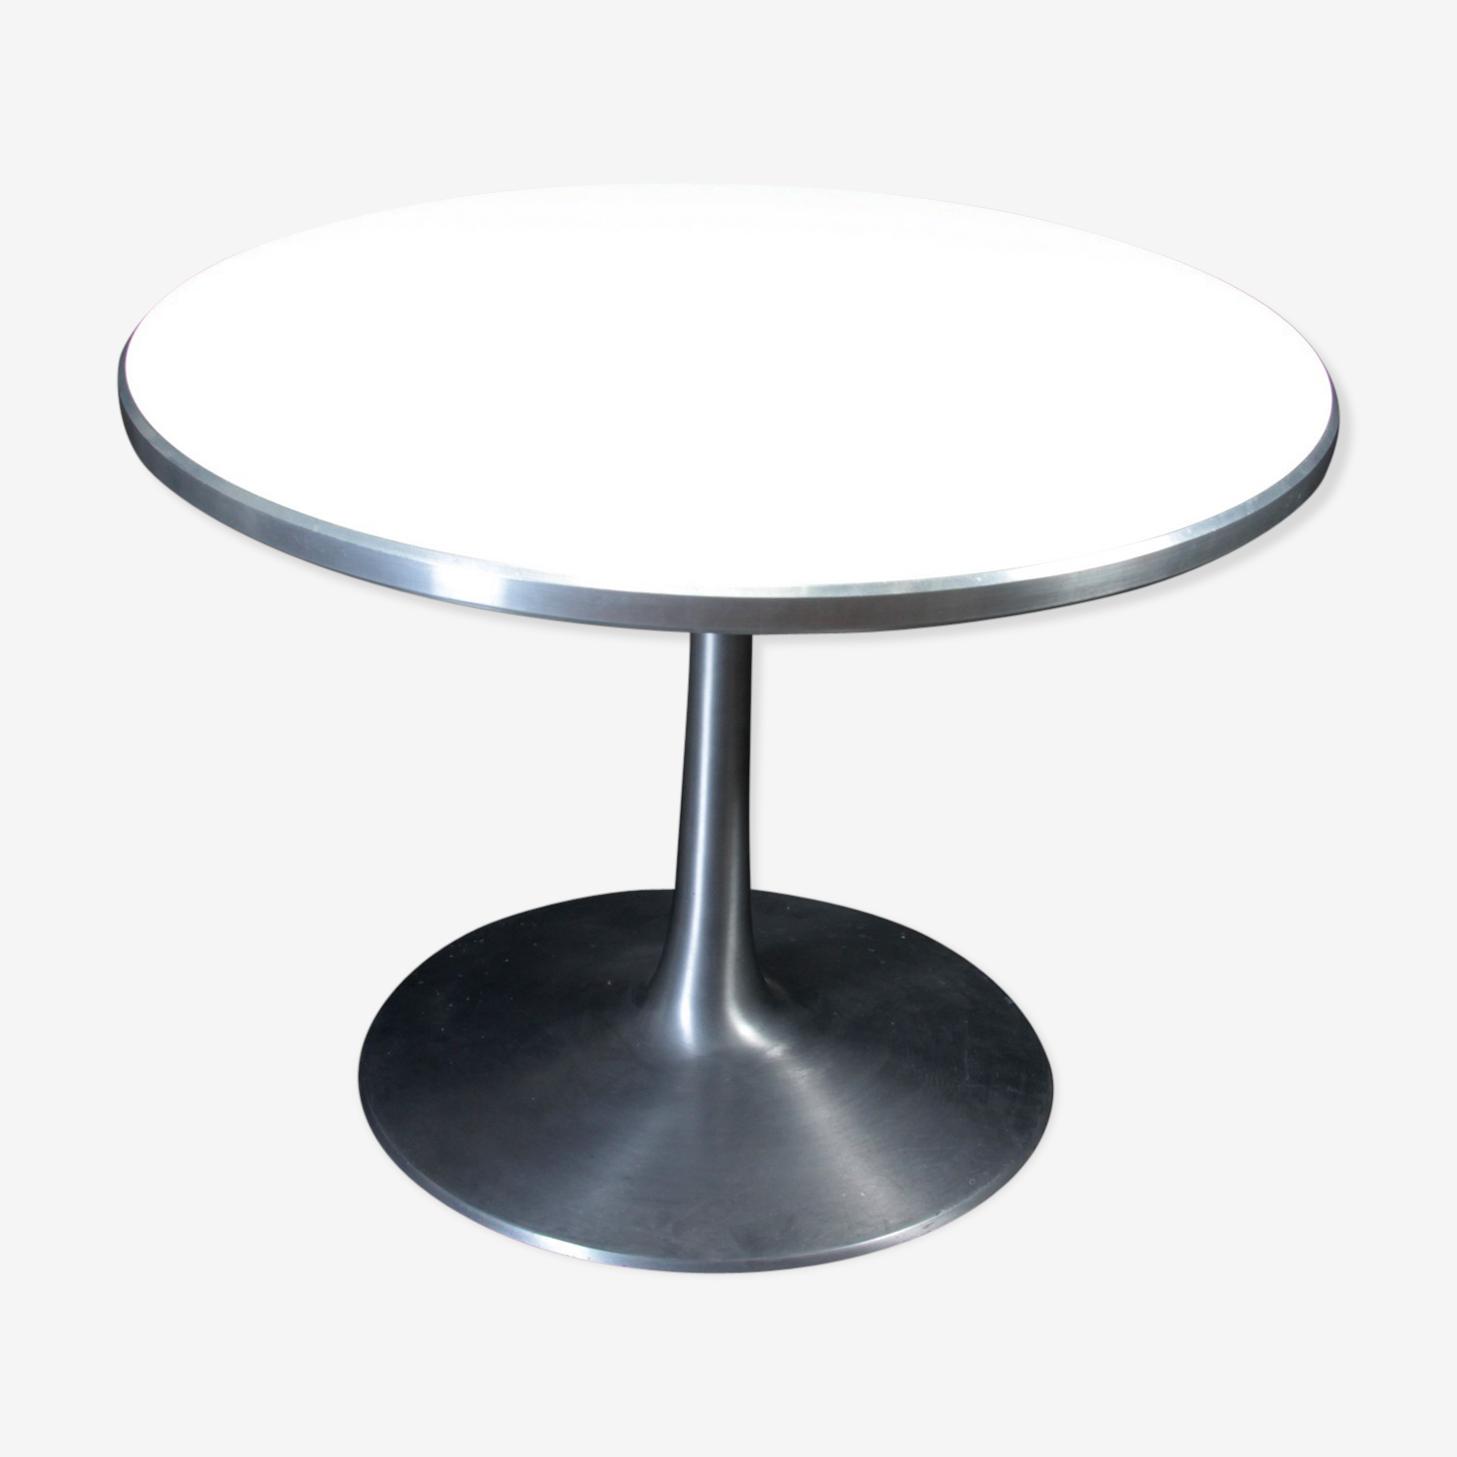 Table by Poul Cadovius for France og sound